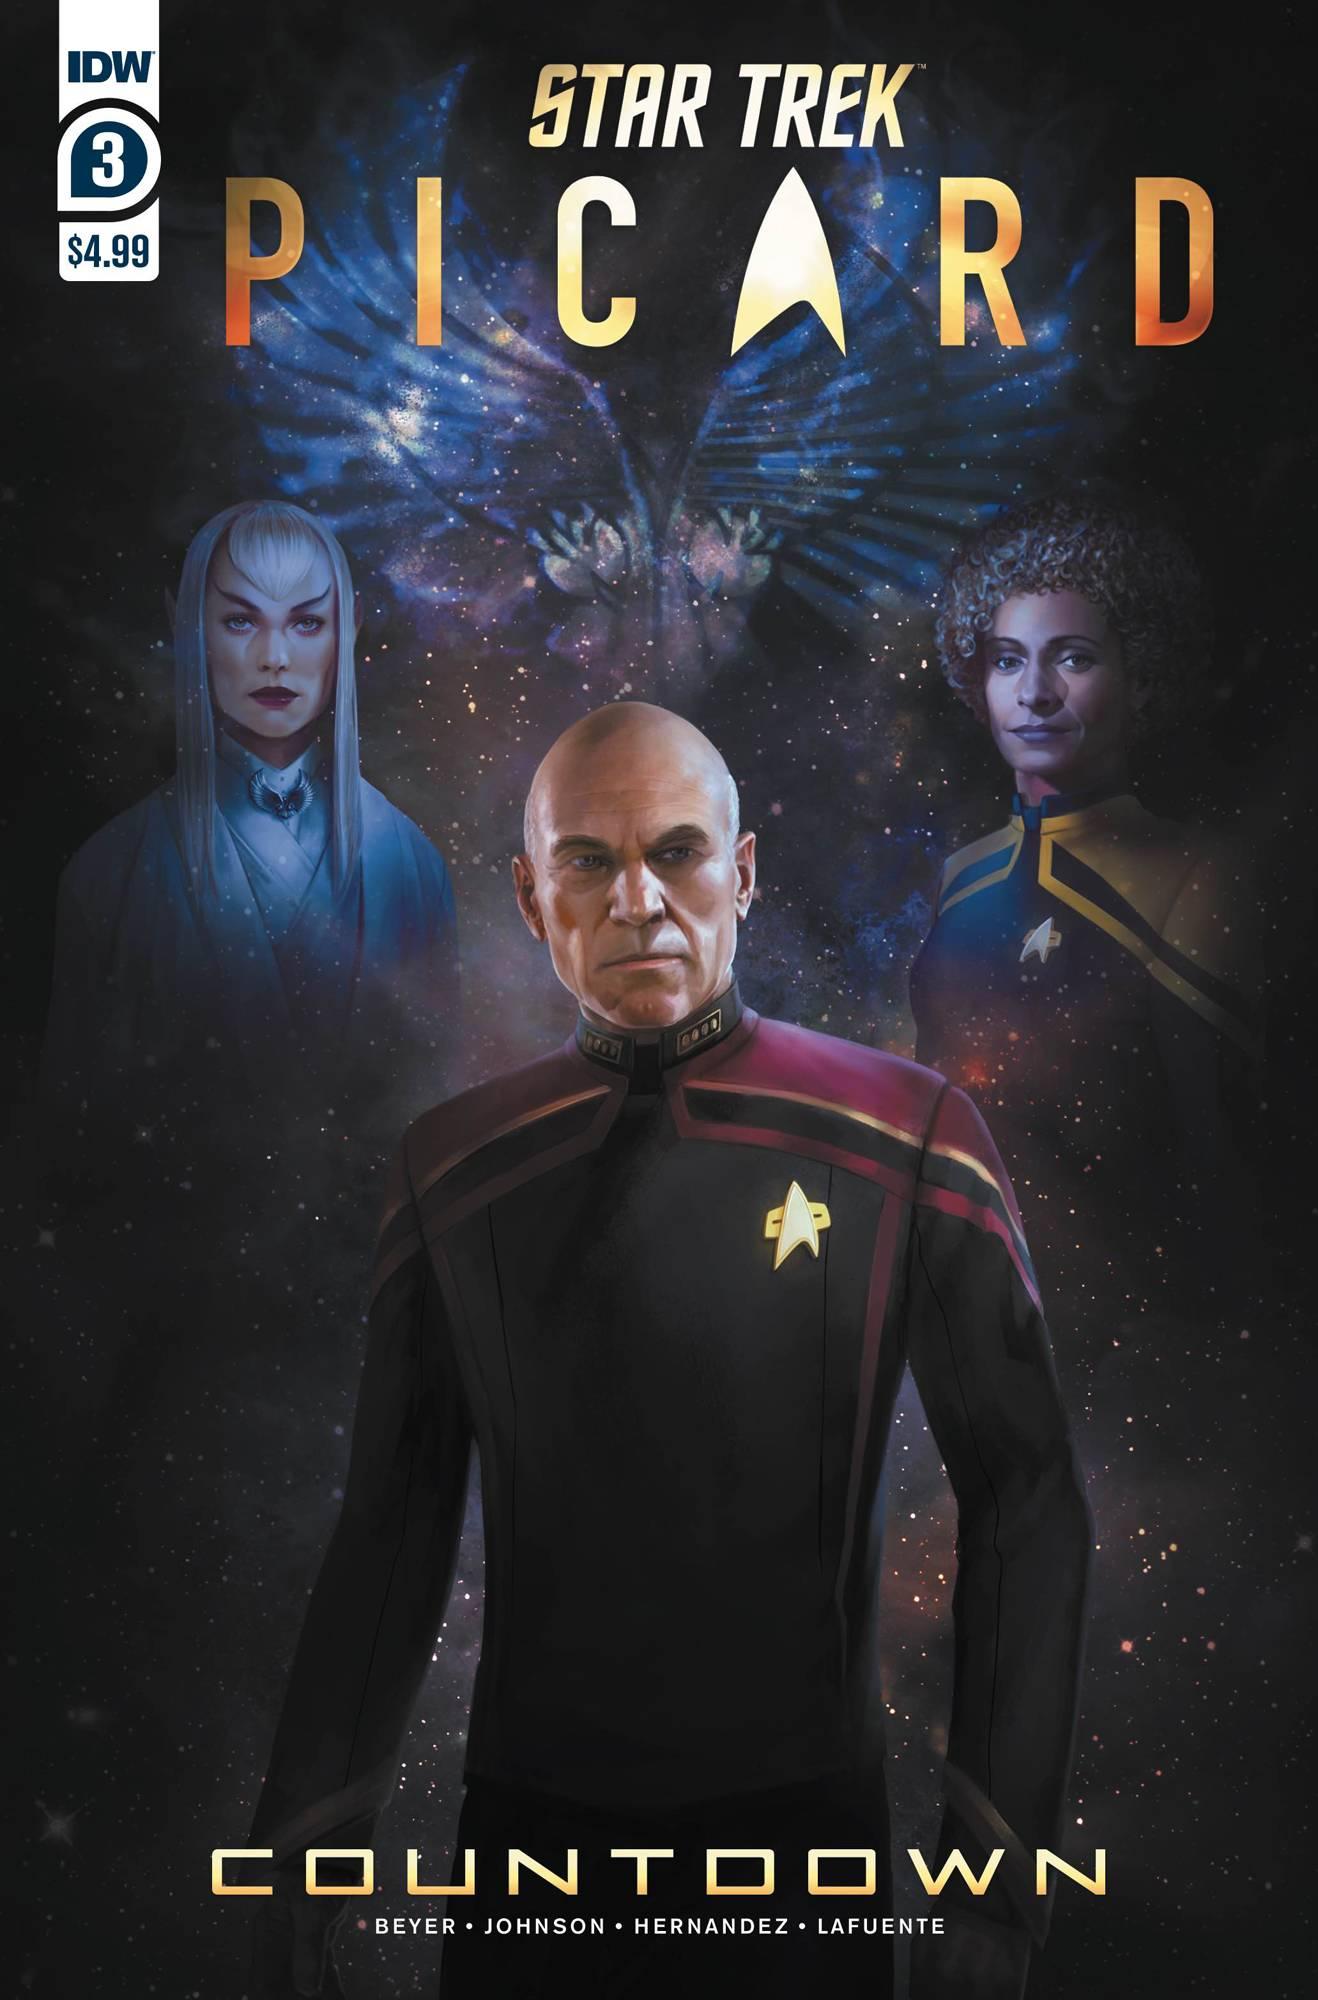 Star Trek: Picard #3 (2020)